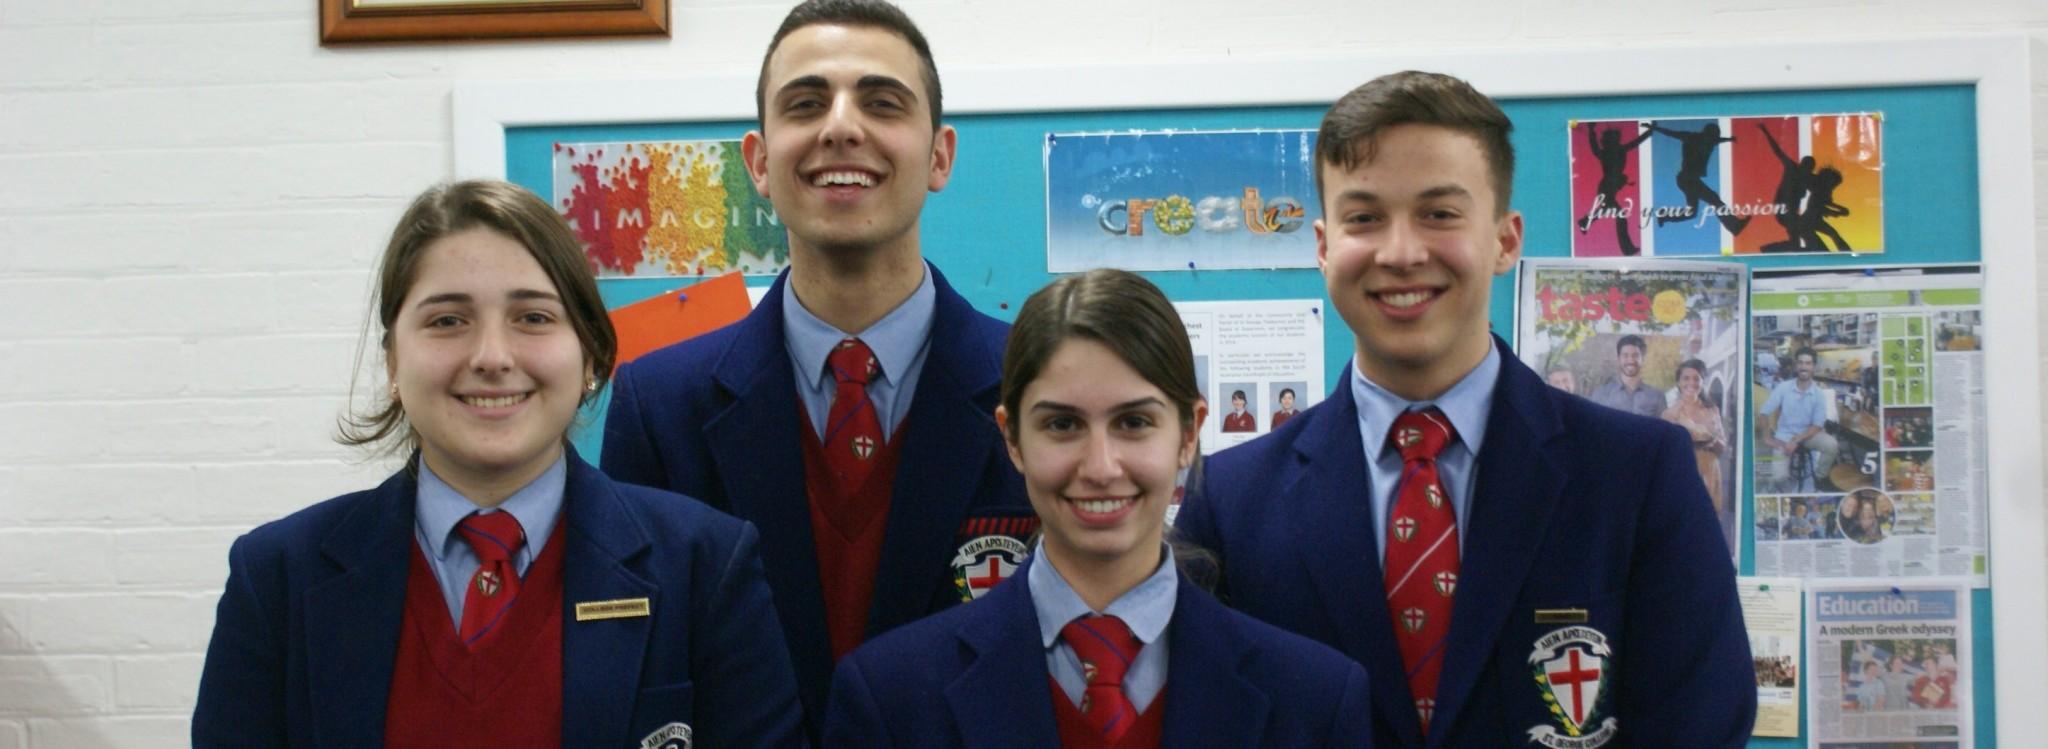 Student Leadership | St George College - Mile End, South Australia